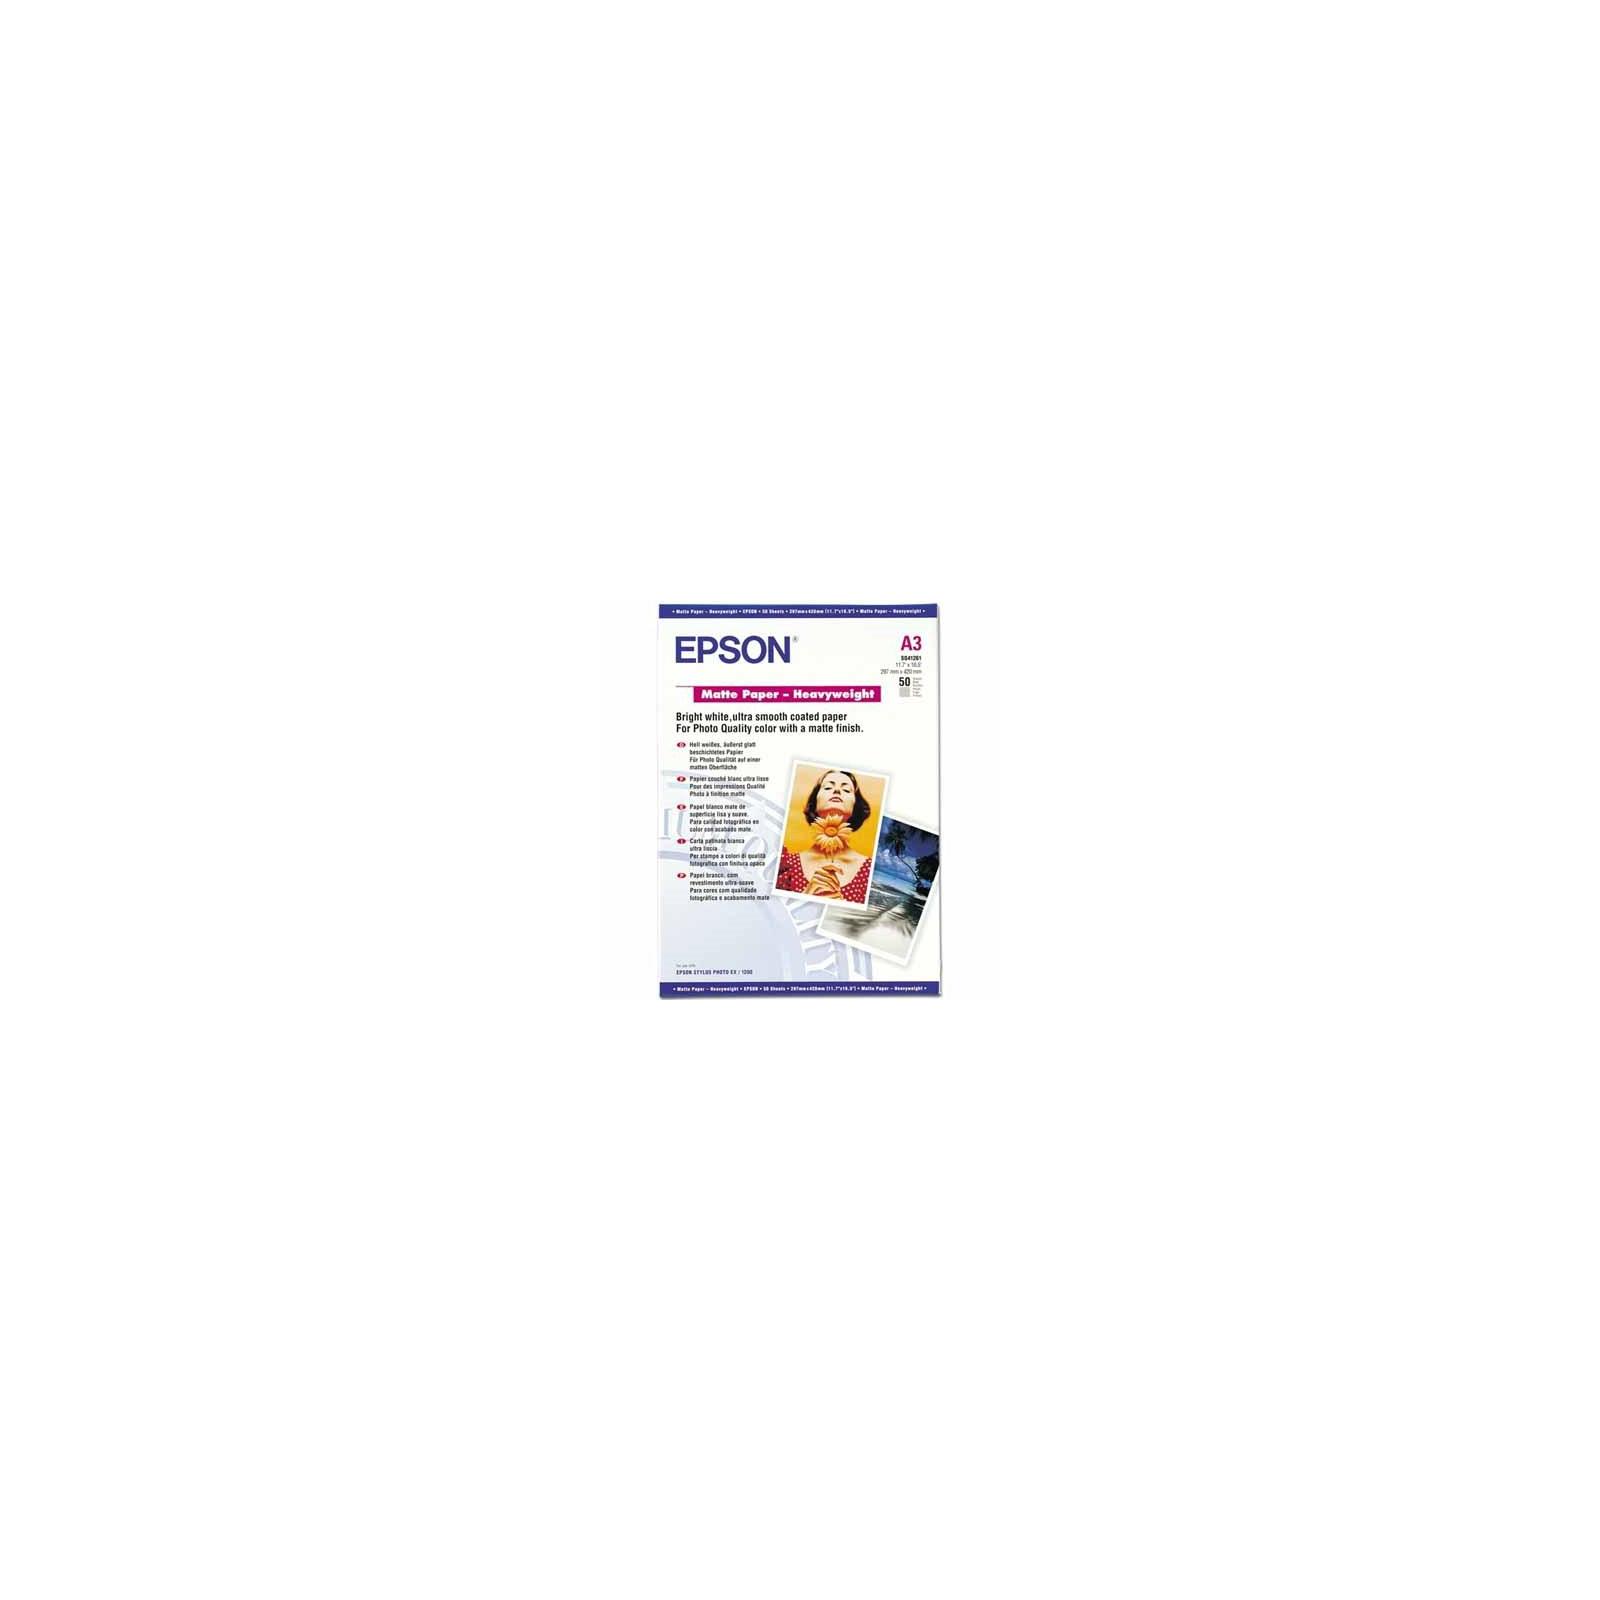 Бумага EPSON A3 Matte Paper-Heavyweight (C13S041261)